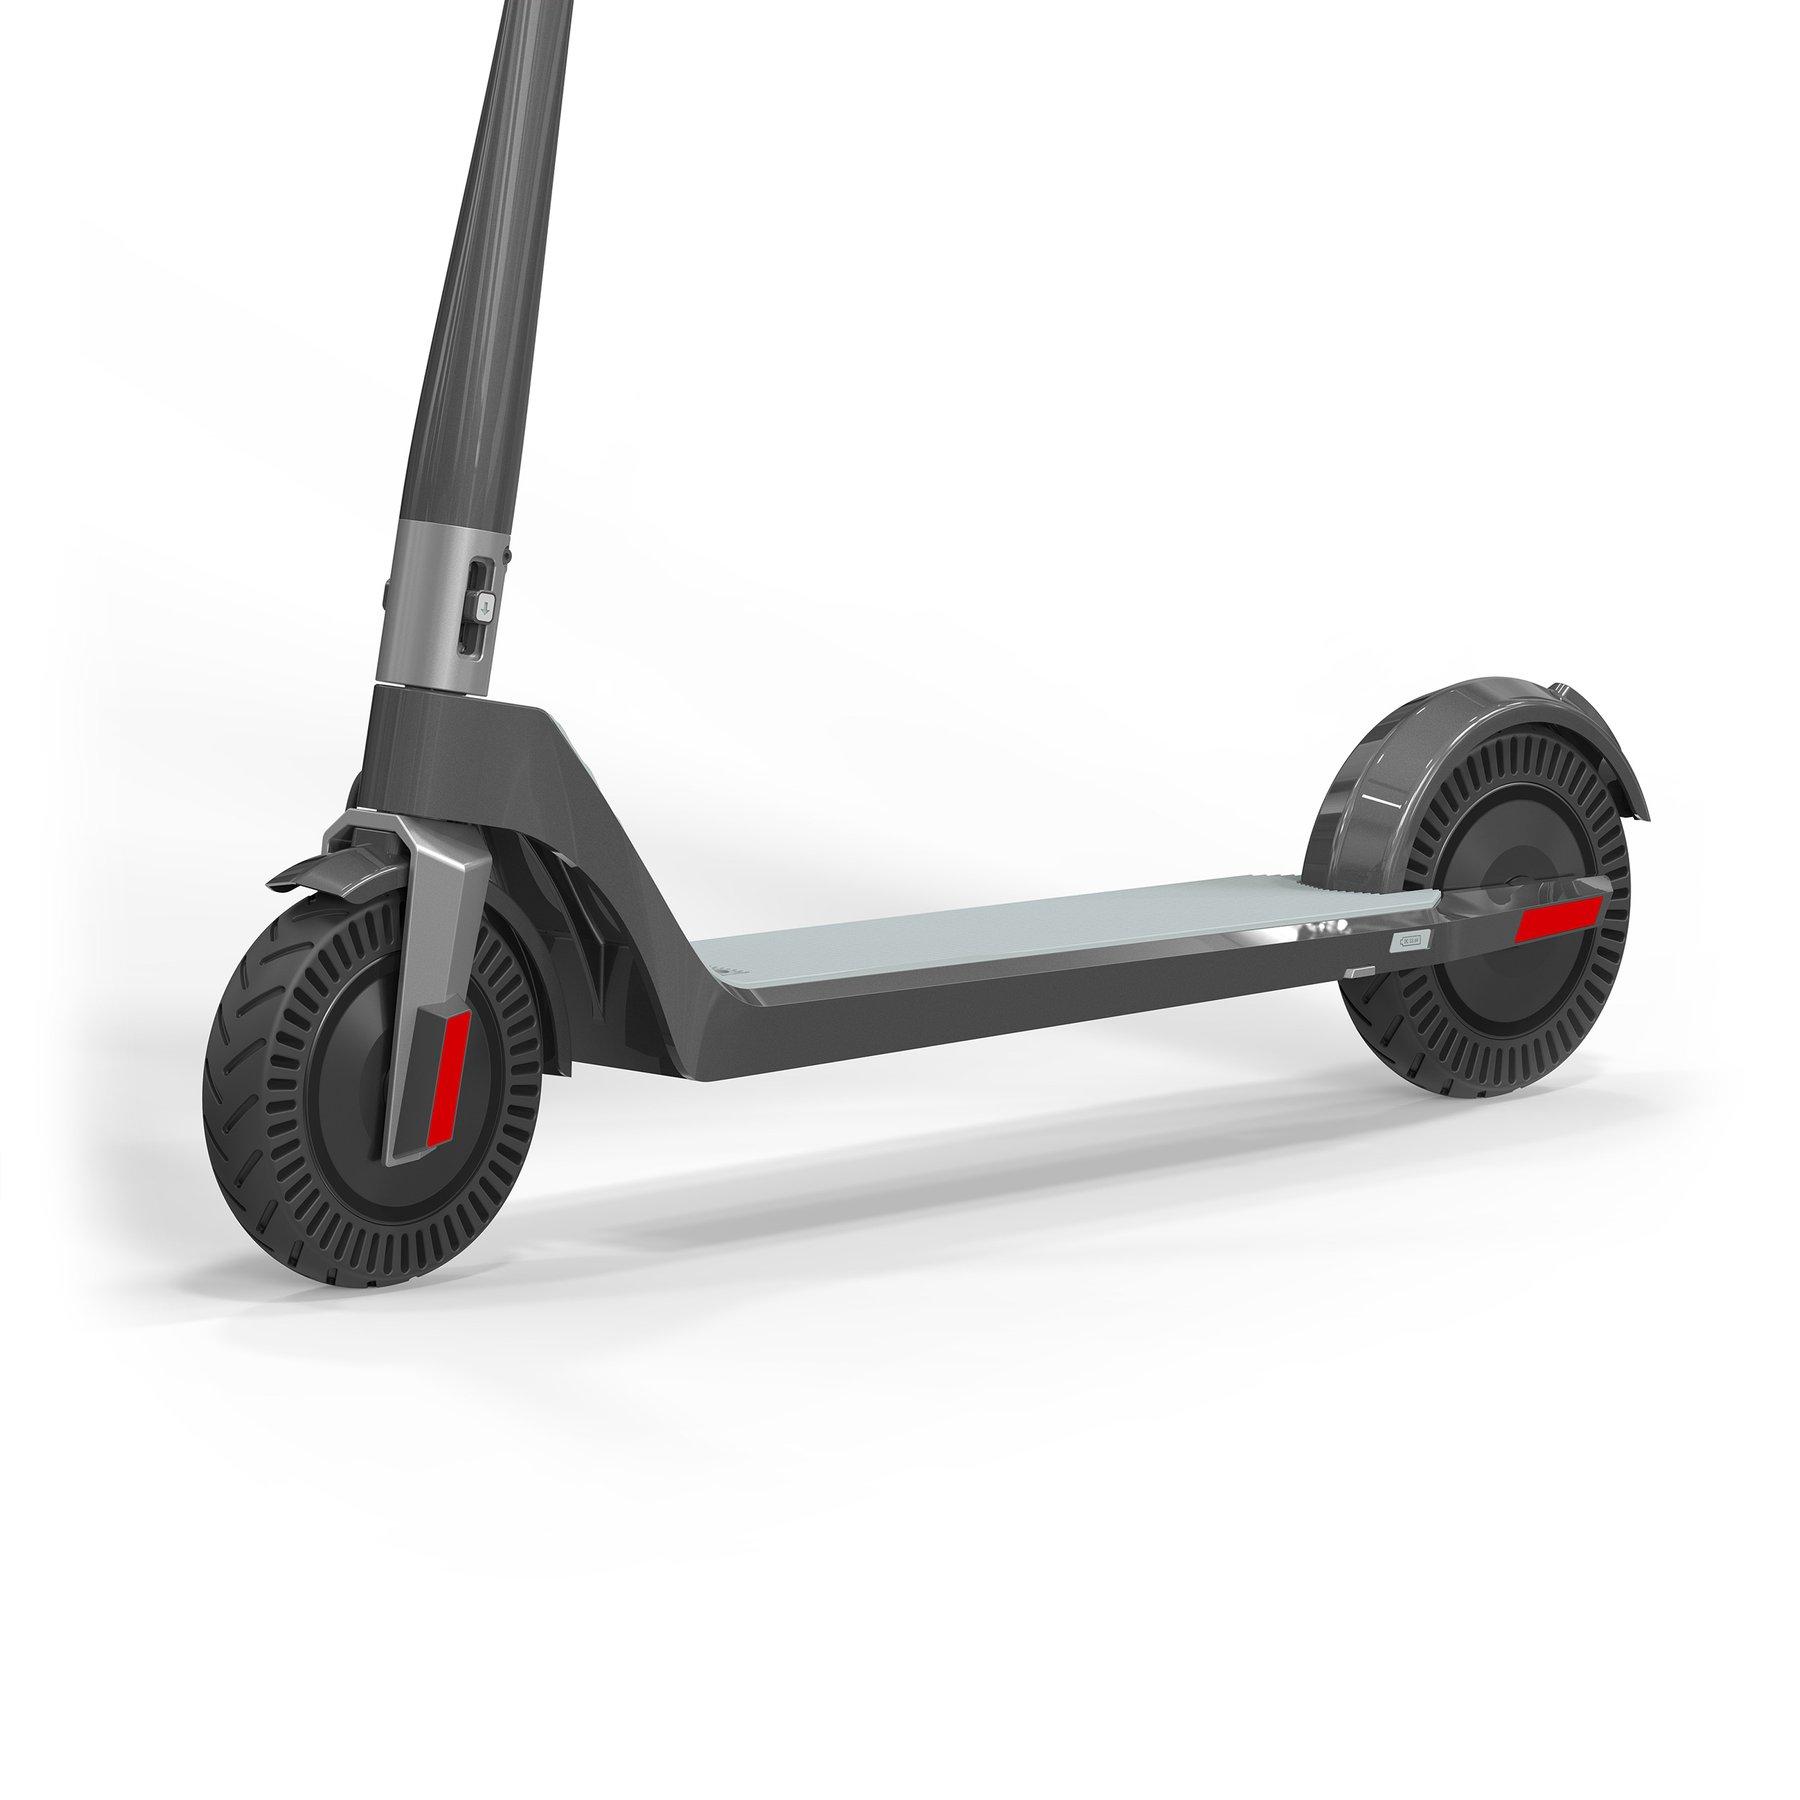 scooter_gotham_04_1800x1800.jpg